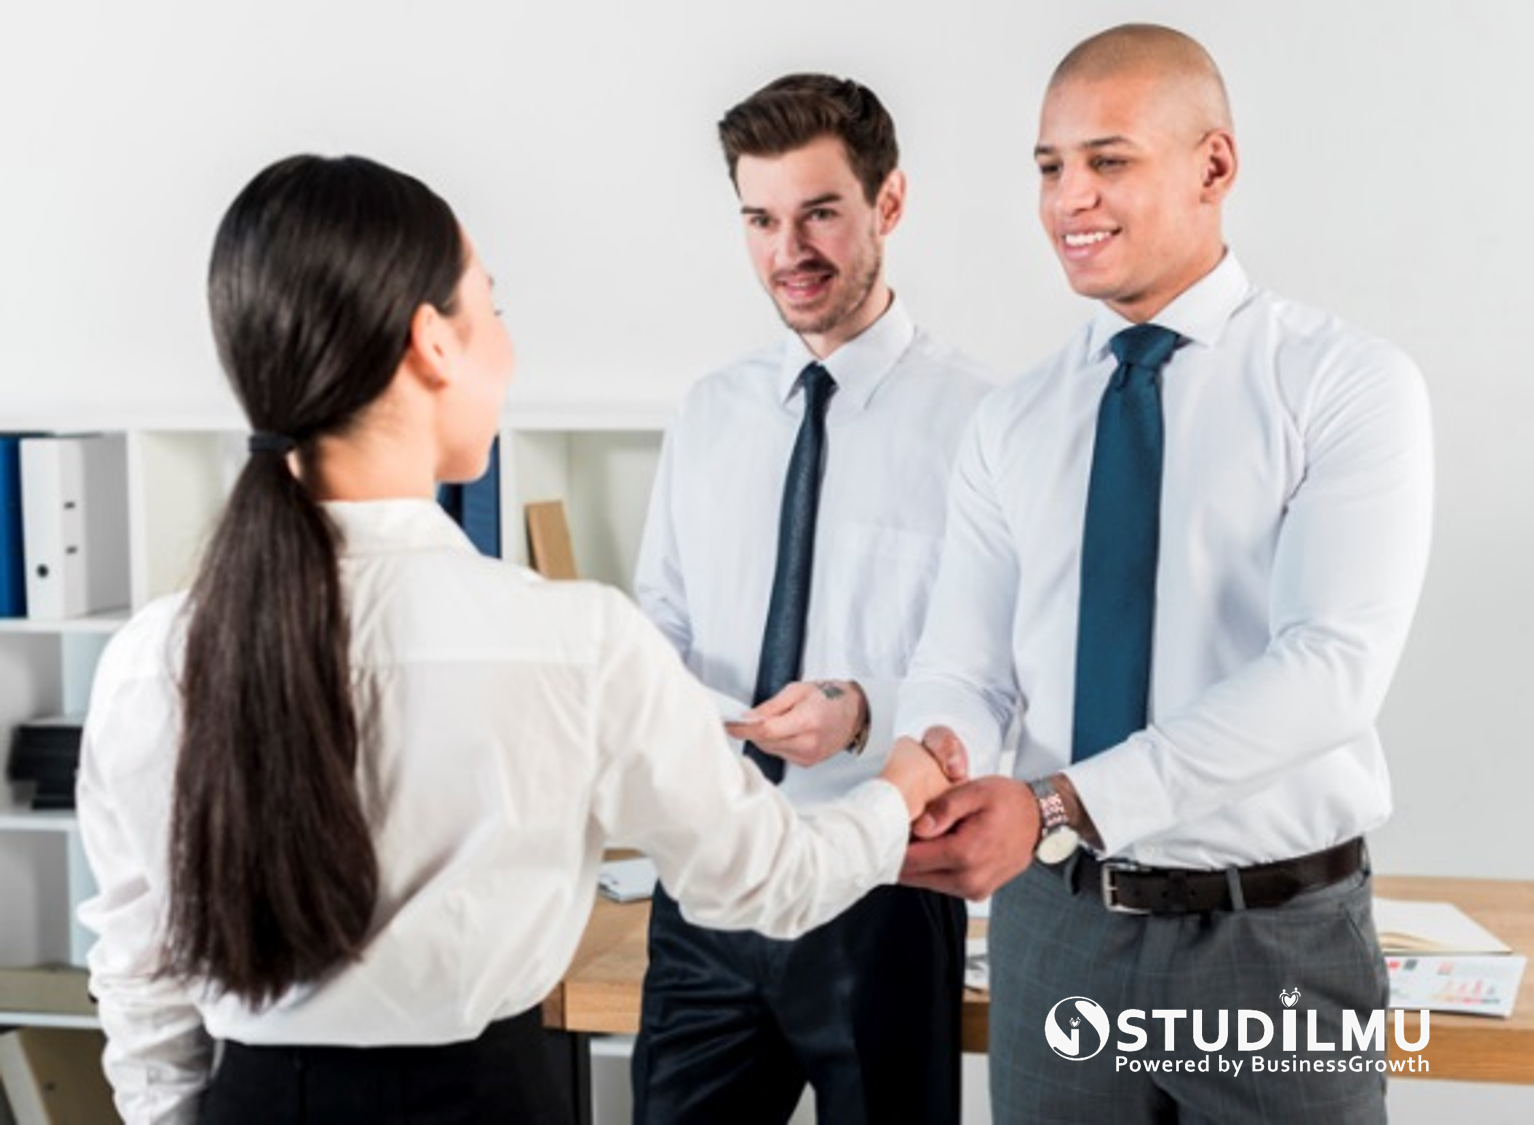 STUDILMU Career Advice - Tips Sederhana Mempersiapkan Diri sebelum Wawancara Kerja